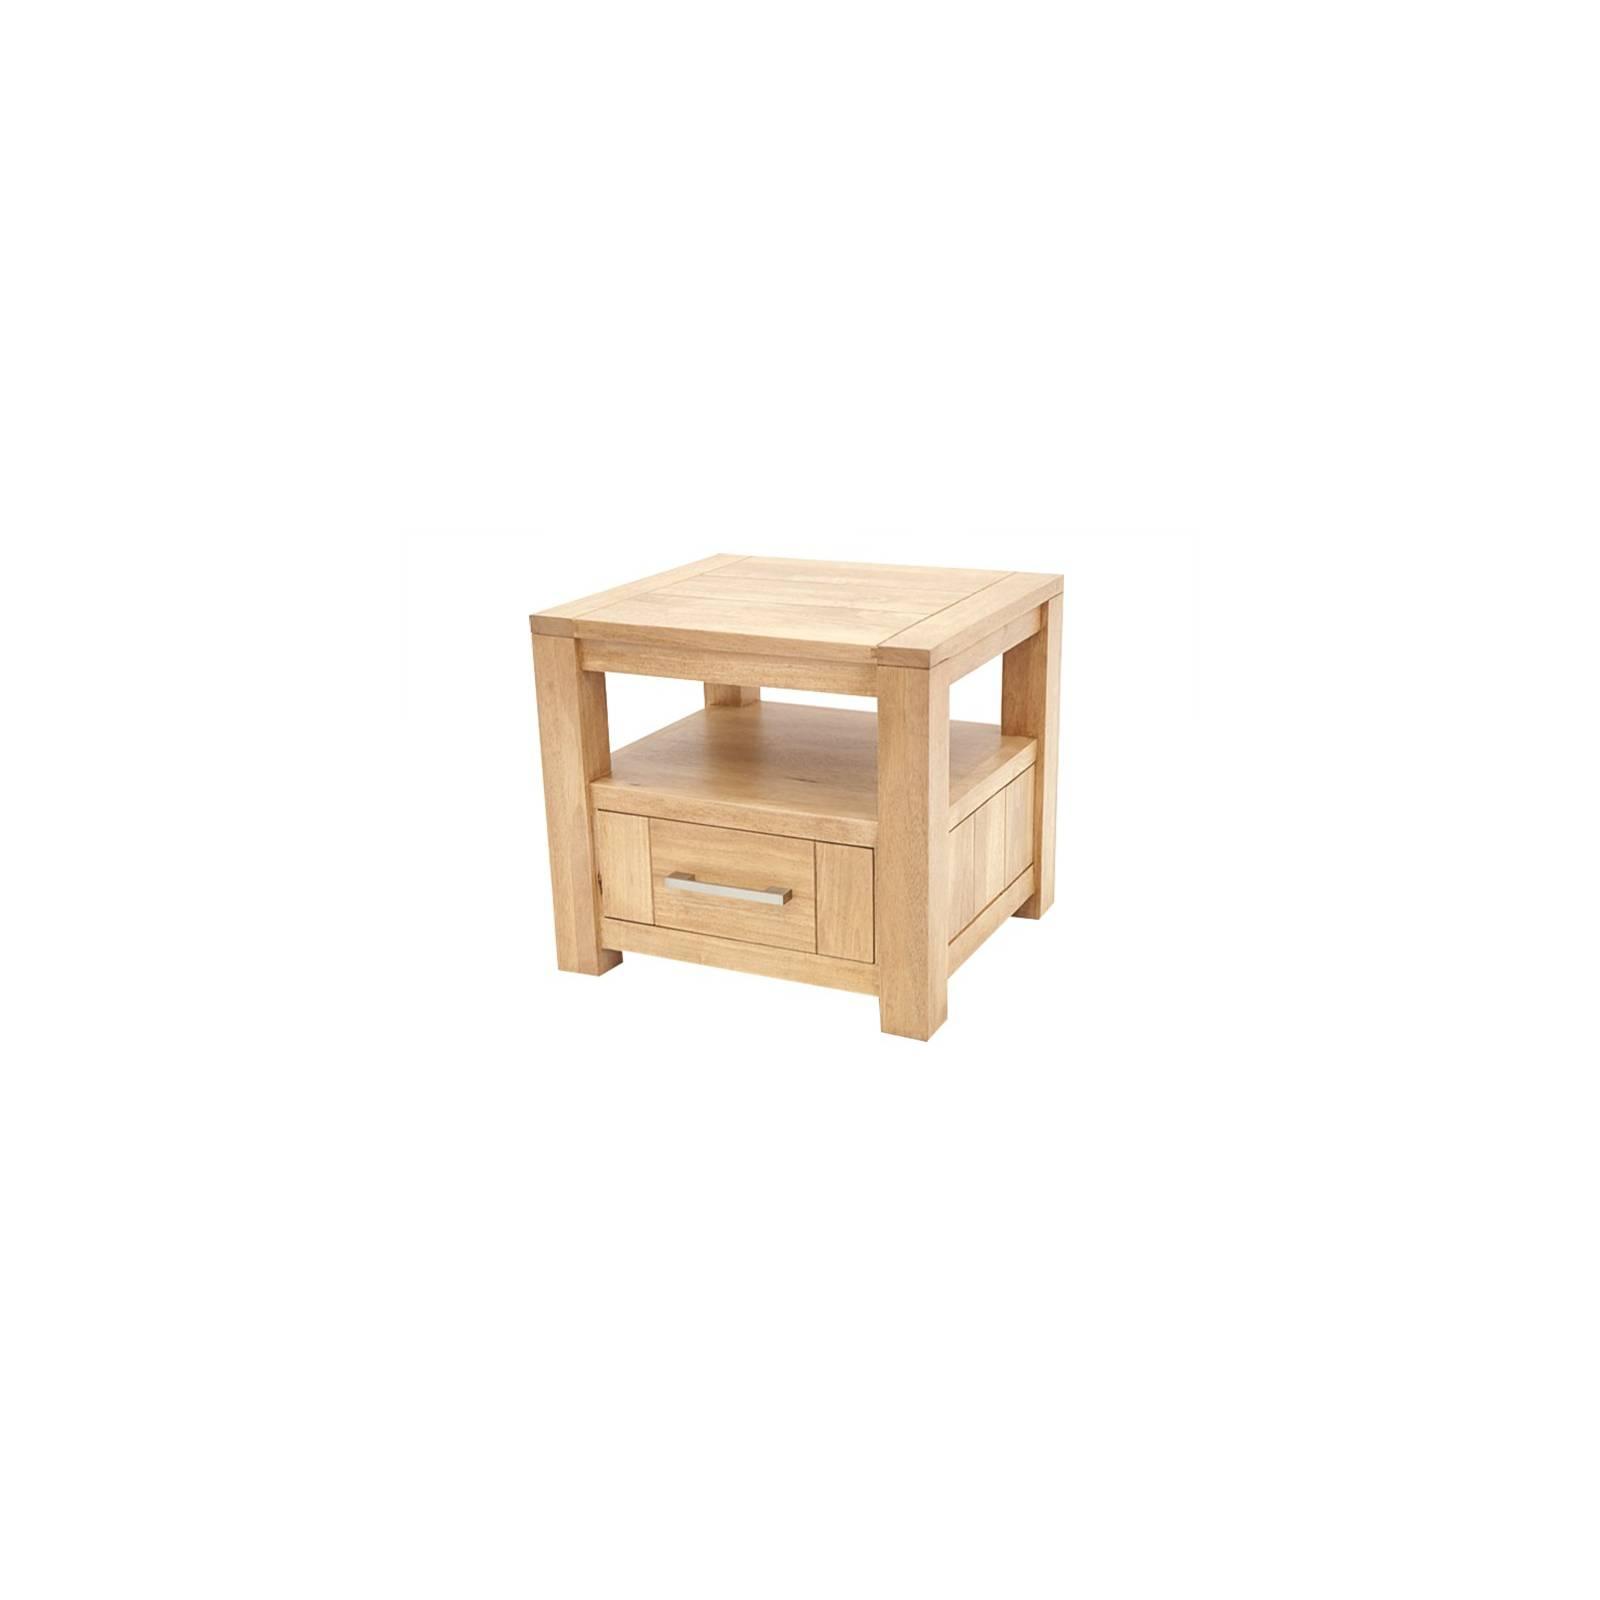 Chevet Broadway Hévéa - meuble bois massif